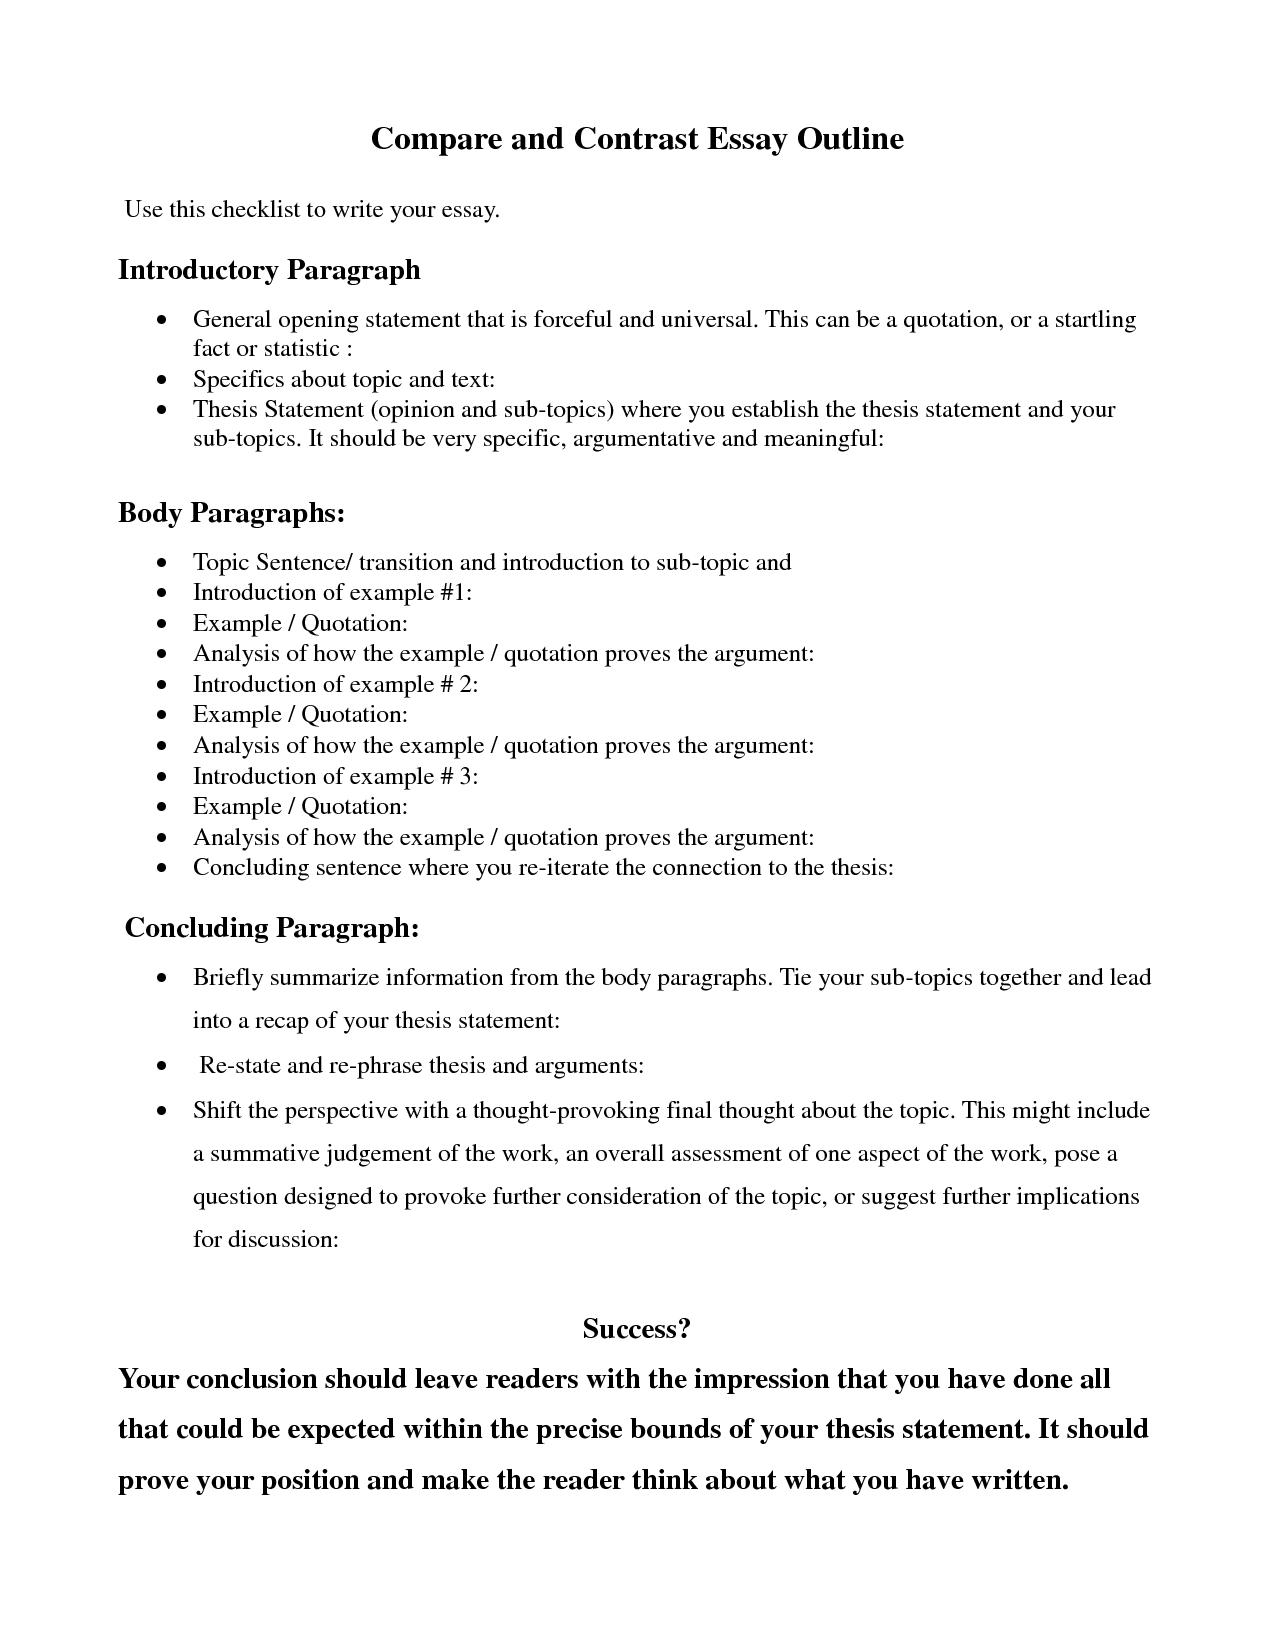 001 Essay Example Comparison Contrast Beautiful Compare Format College Graphic Organizer Pdf Examples Full